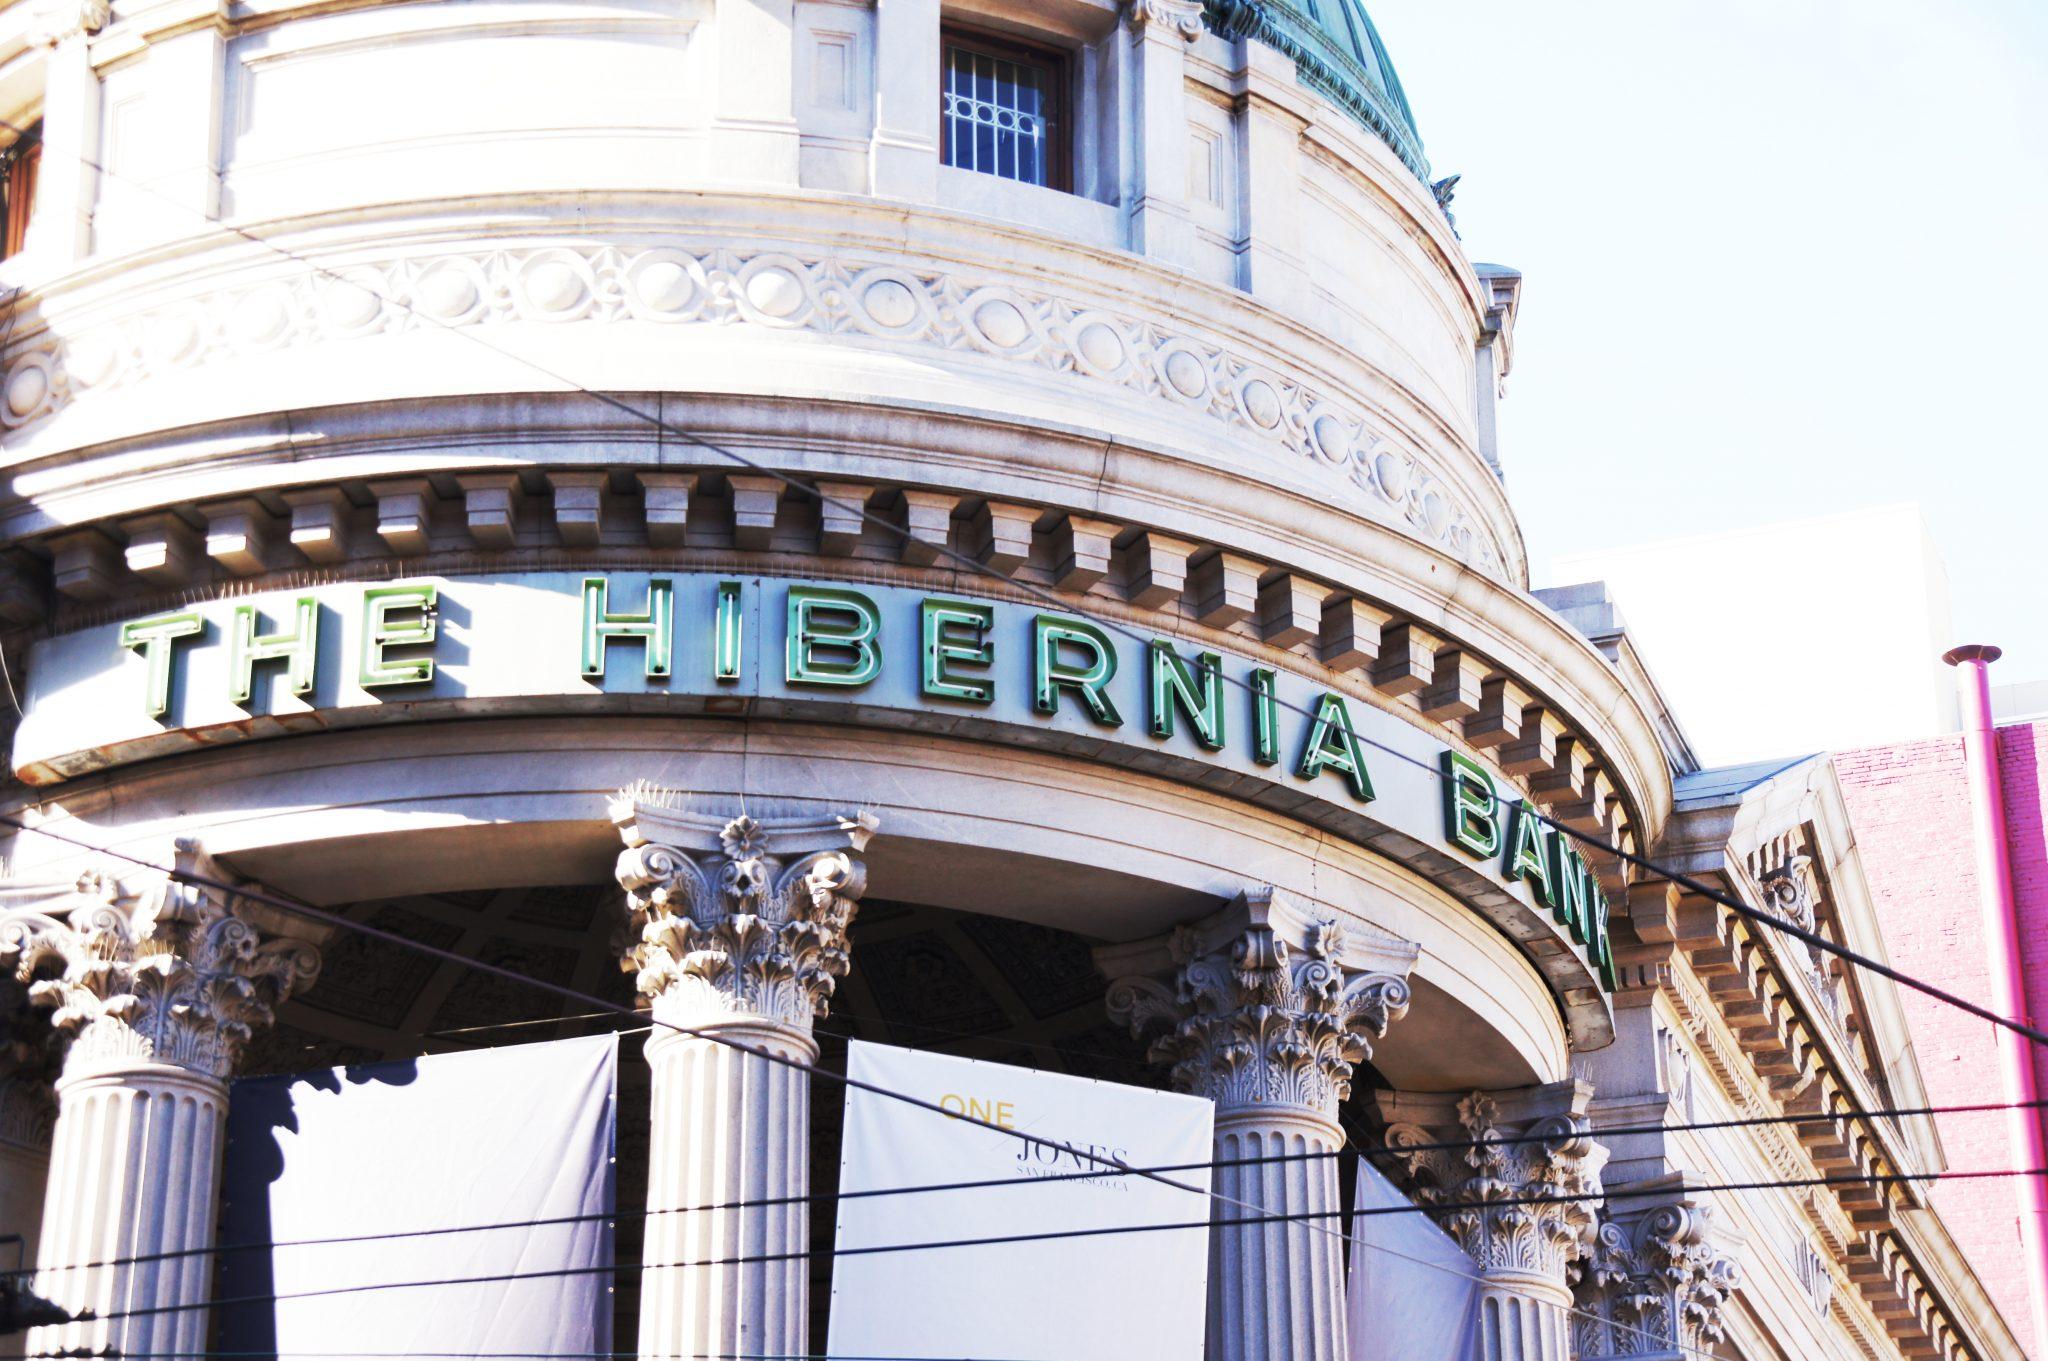 The hierbernia bank